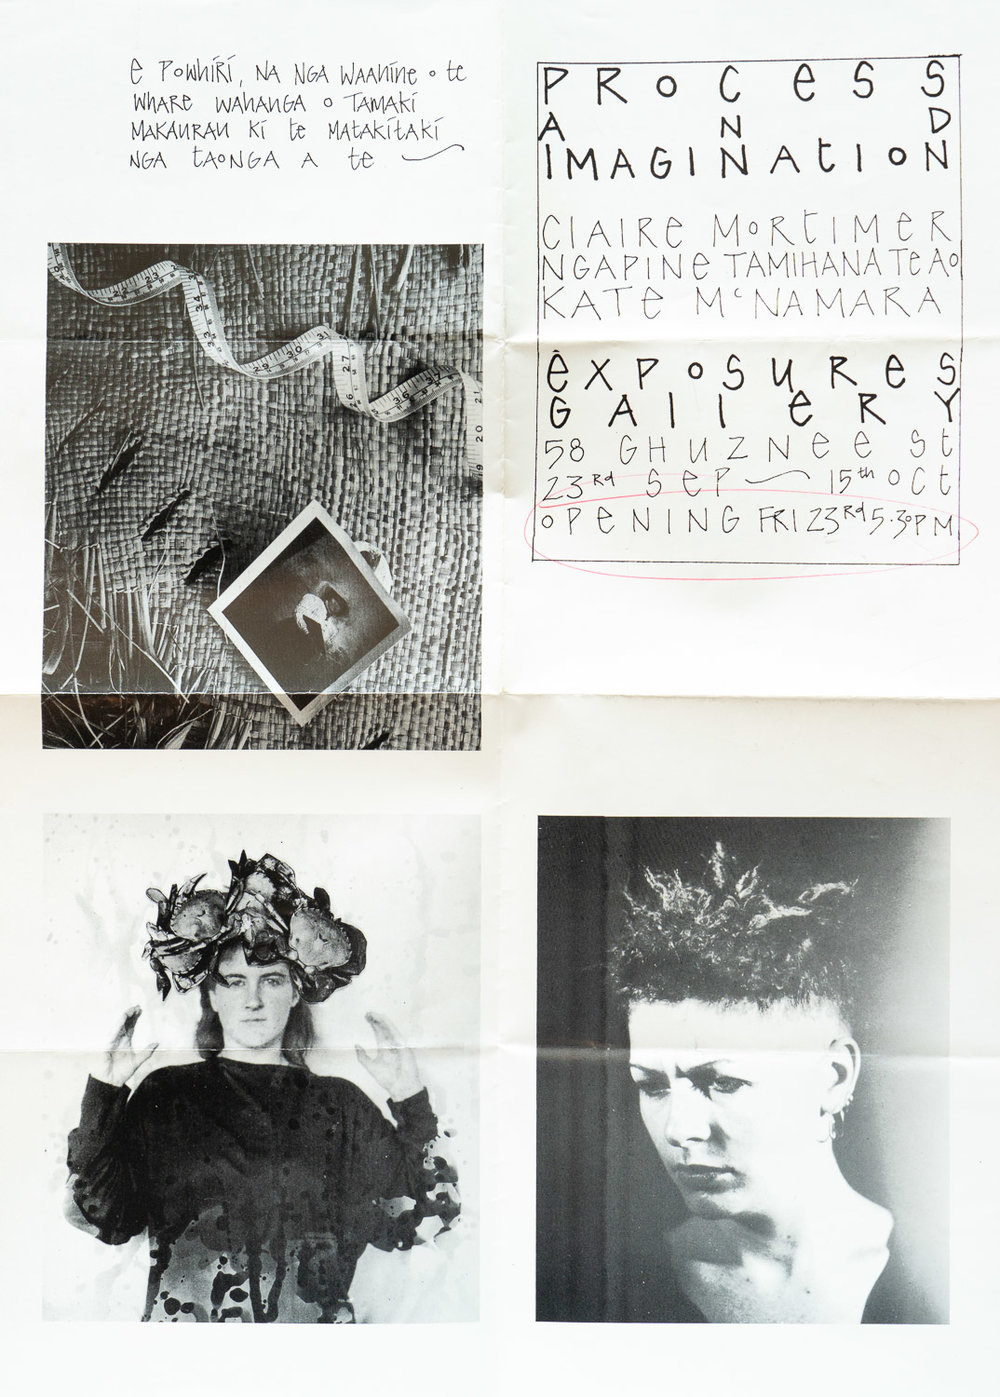 "Claire Mortimer, Ngapine Tamihana Te Ao, Kate McNamara""Process and Imagination""23 September – 15 October 1988"